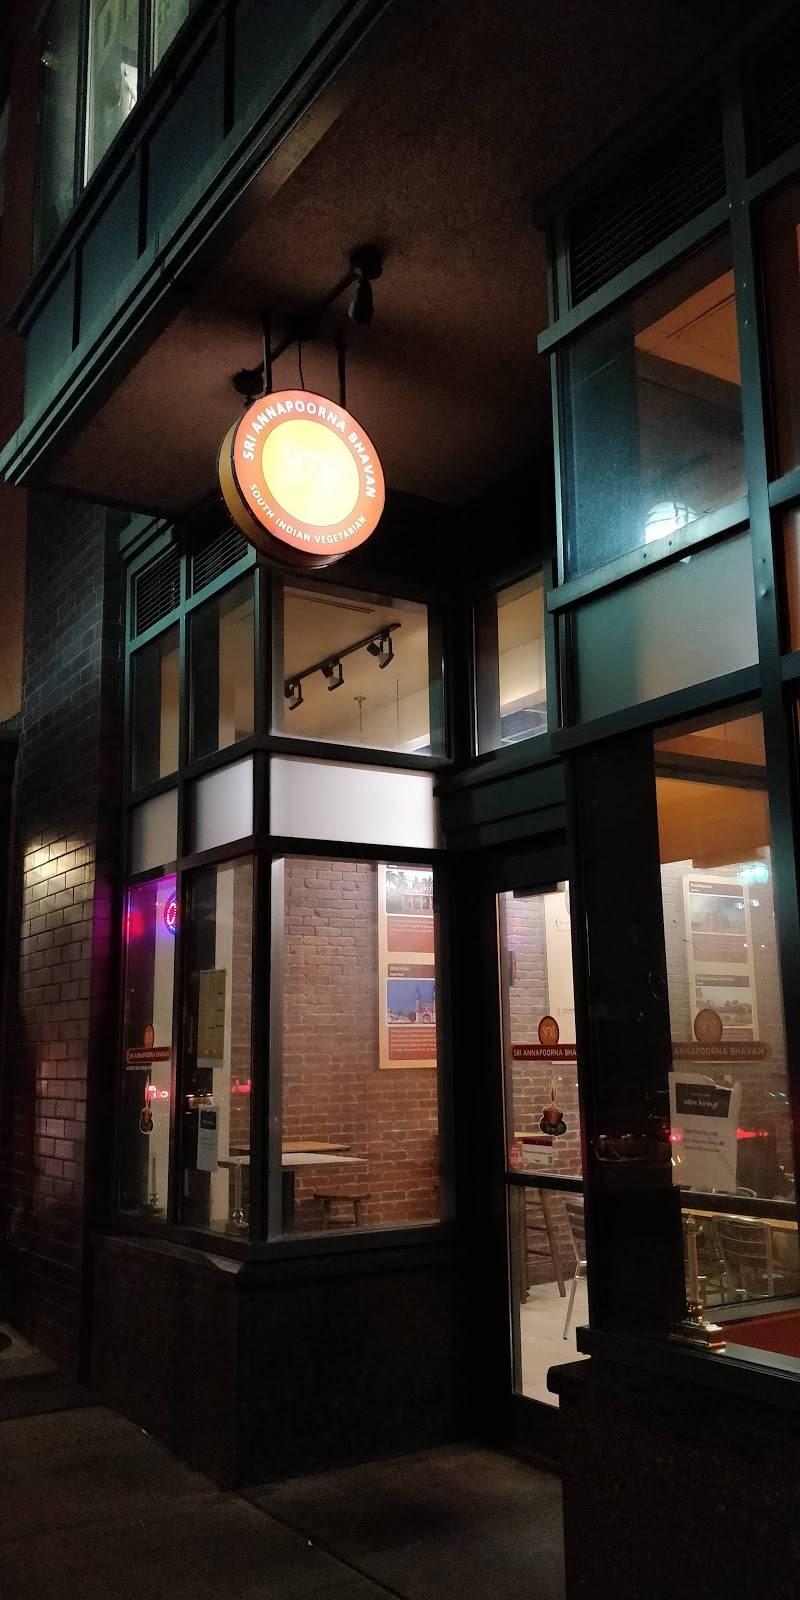 Sri Annapoorna Bhavan | restaurant | 105 Greene St, Jersey City, NJ 07302, USA | 2014342300 OR +1 201-434-2300